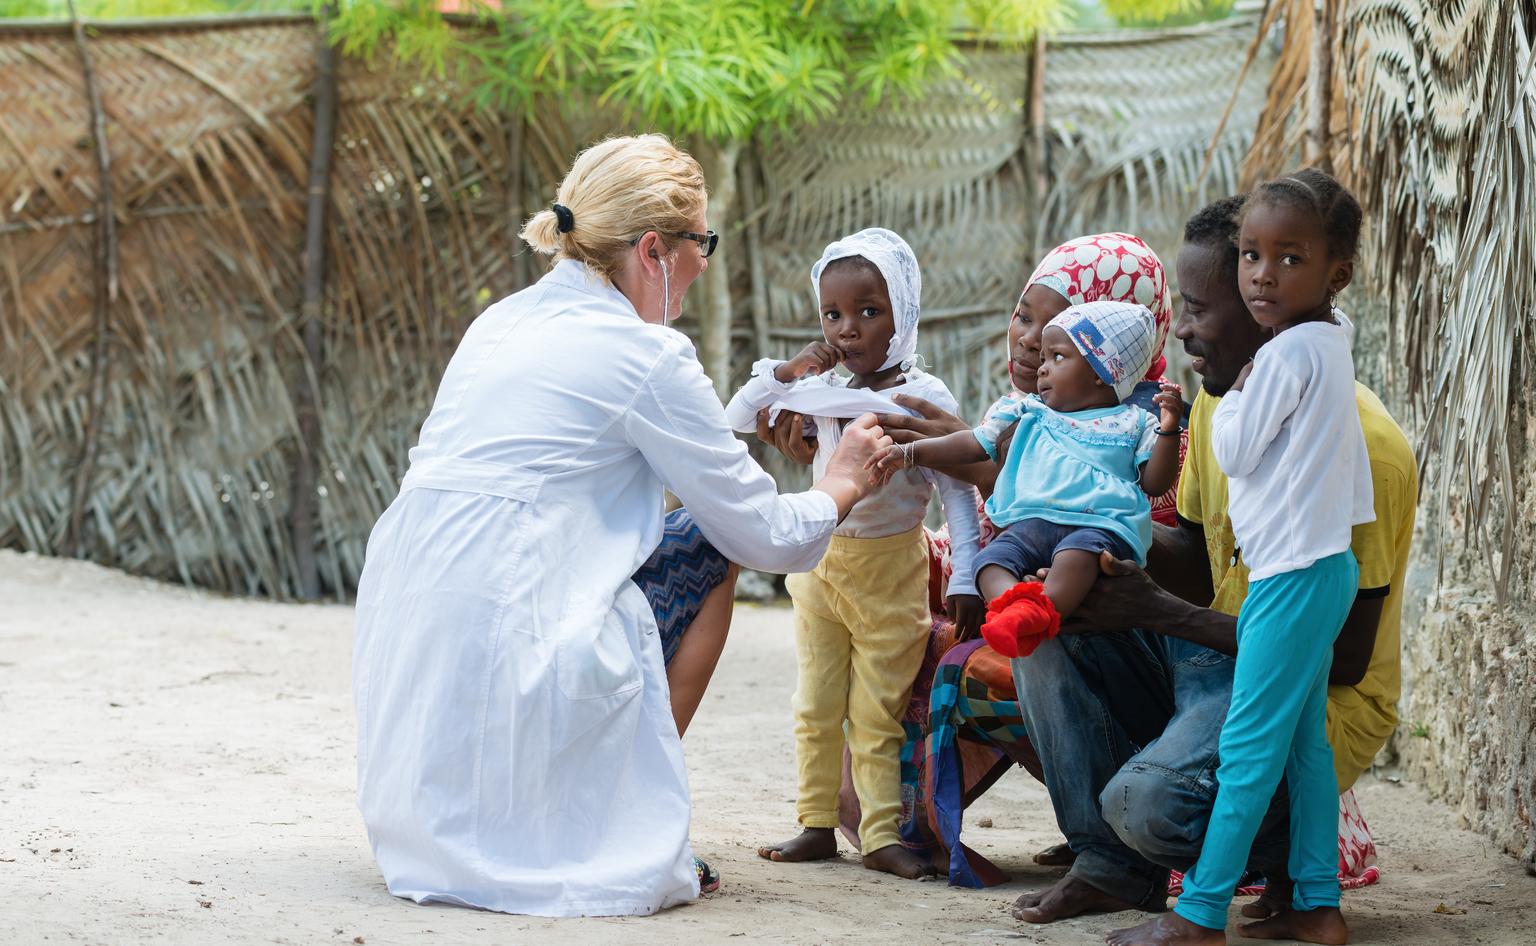 Physician listening to child's heartbeat outdoorsdoors